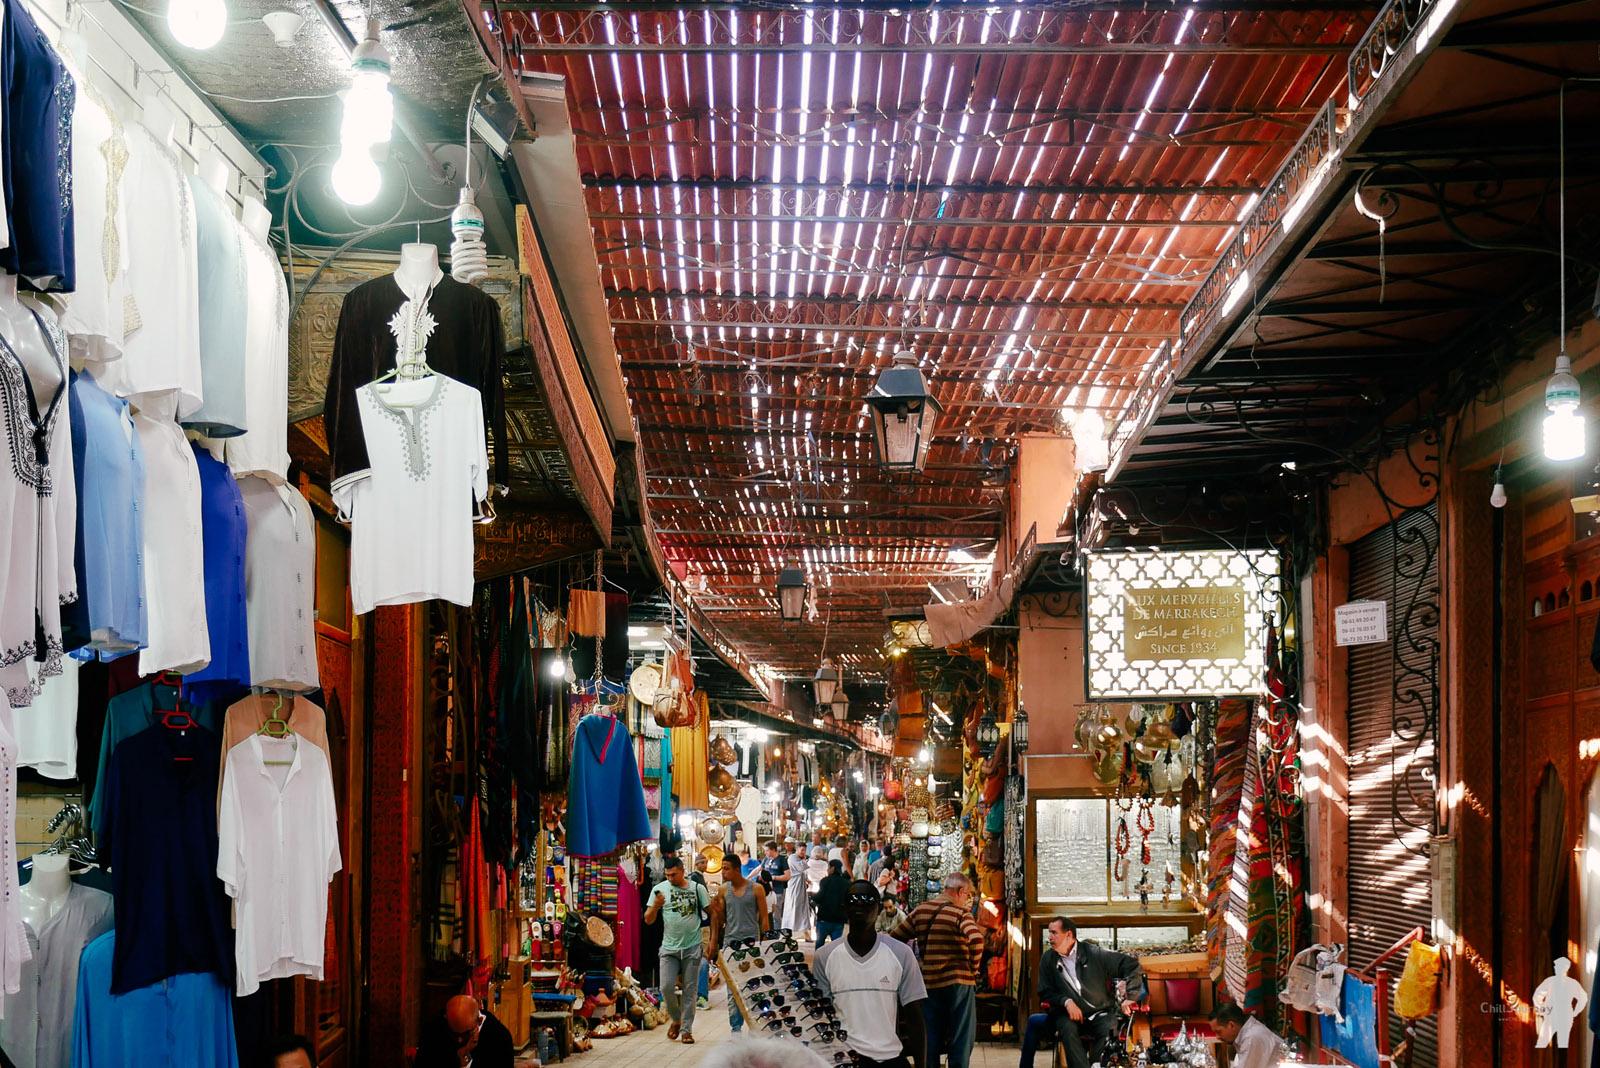 Morocco_00035